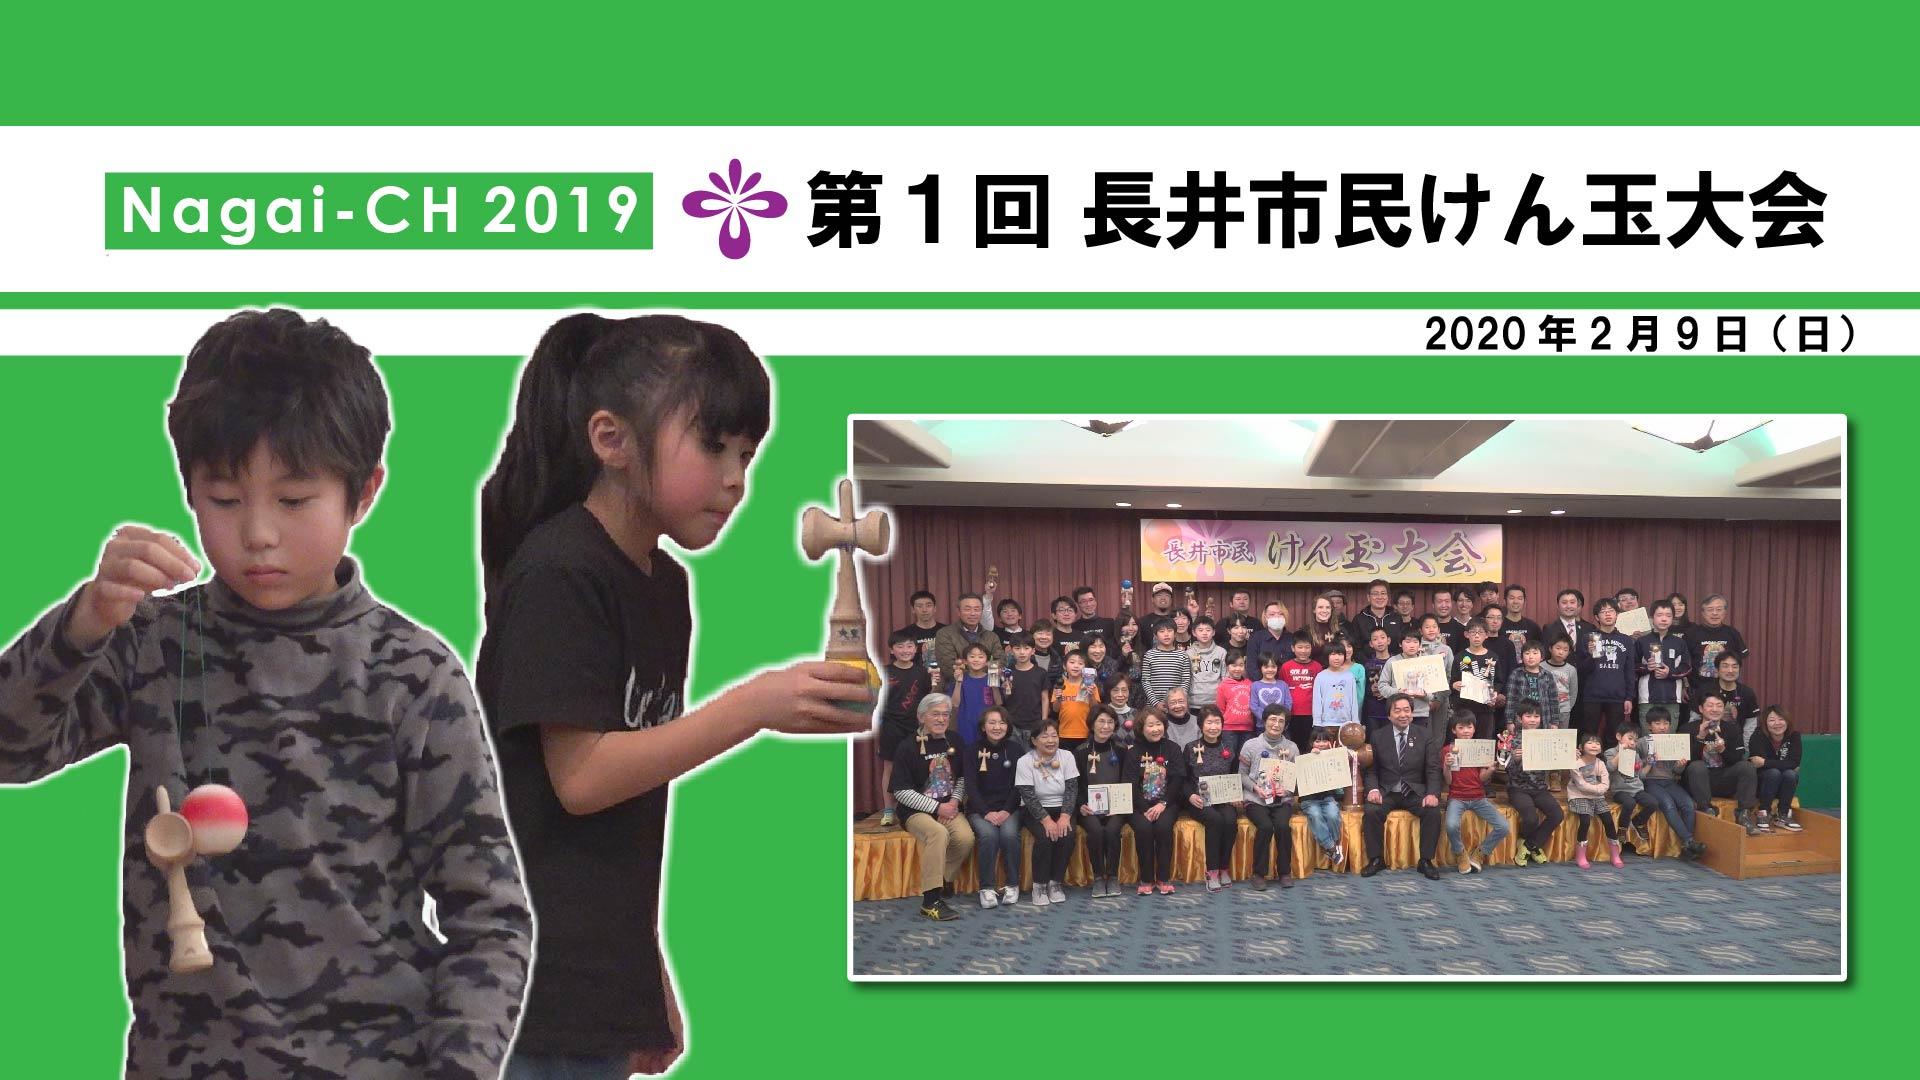 【長井市】第1回長井市民けん玉大会(令和2年2月9日) :画像